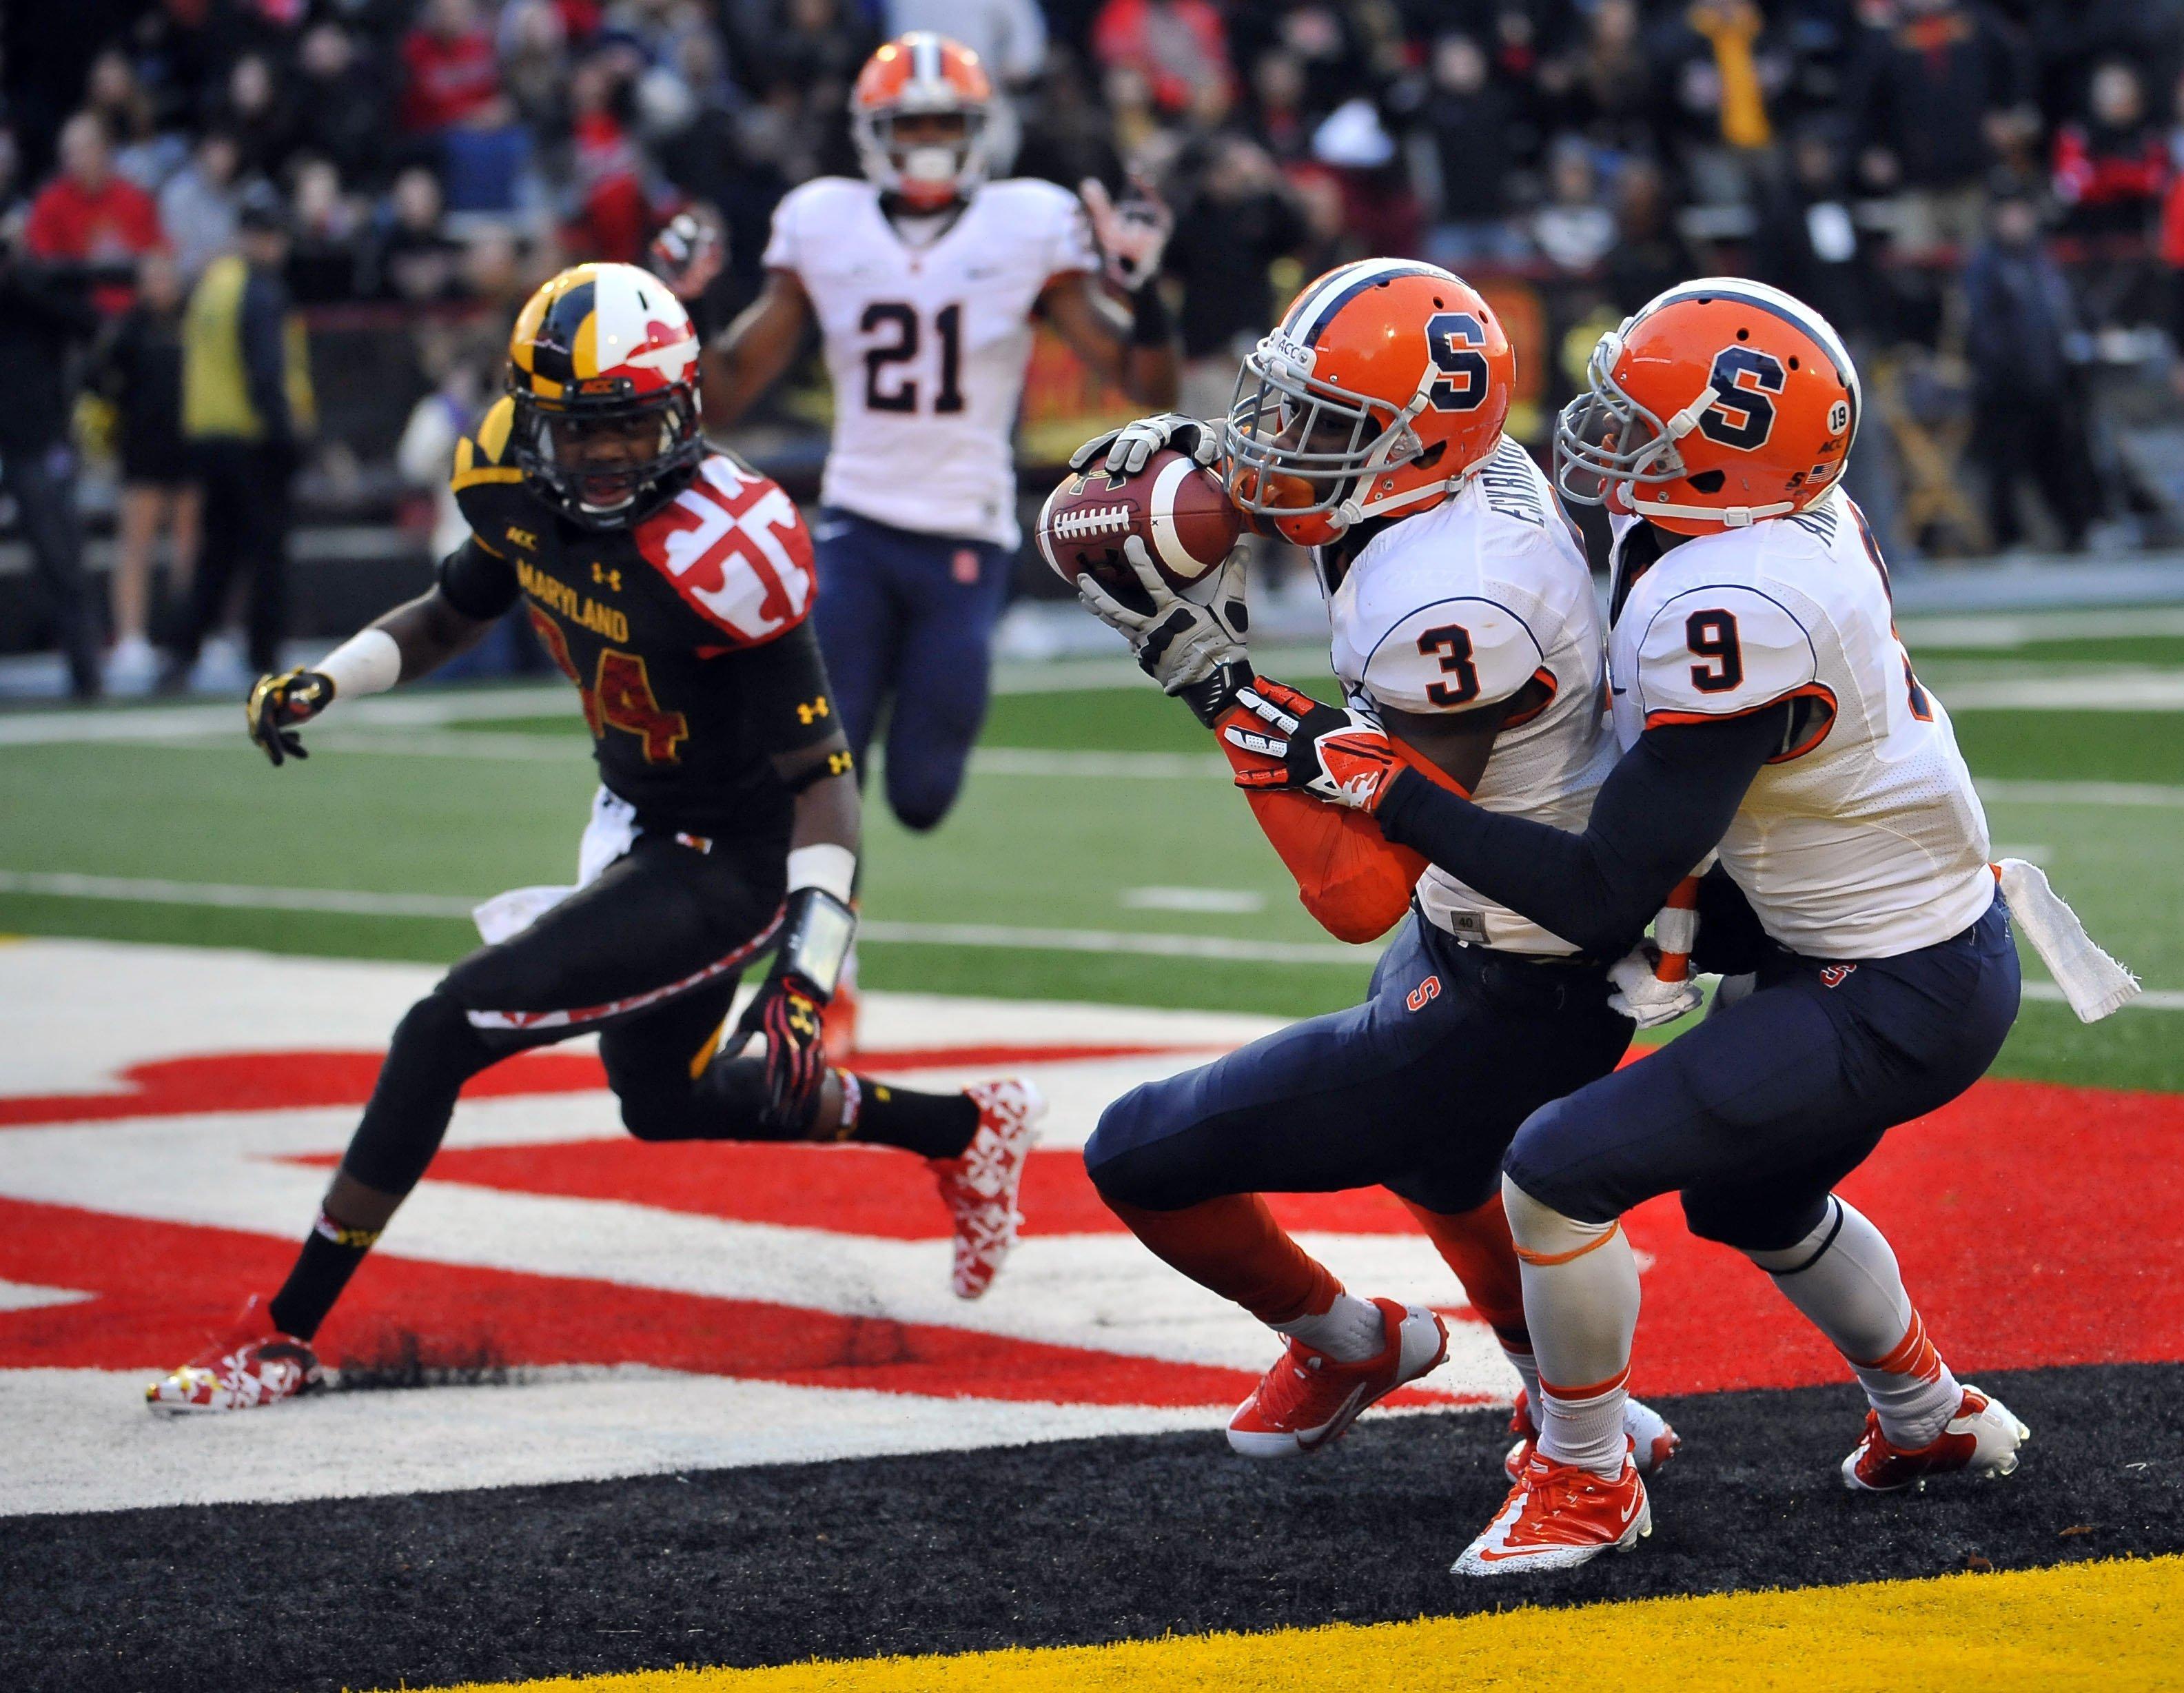 Syracuse v Maryland football